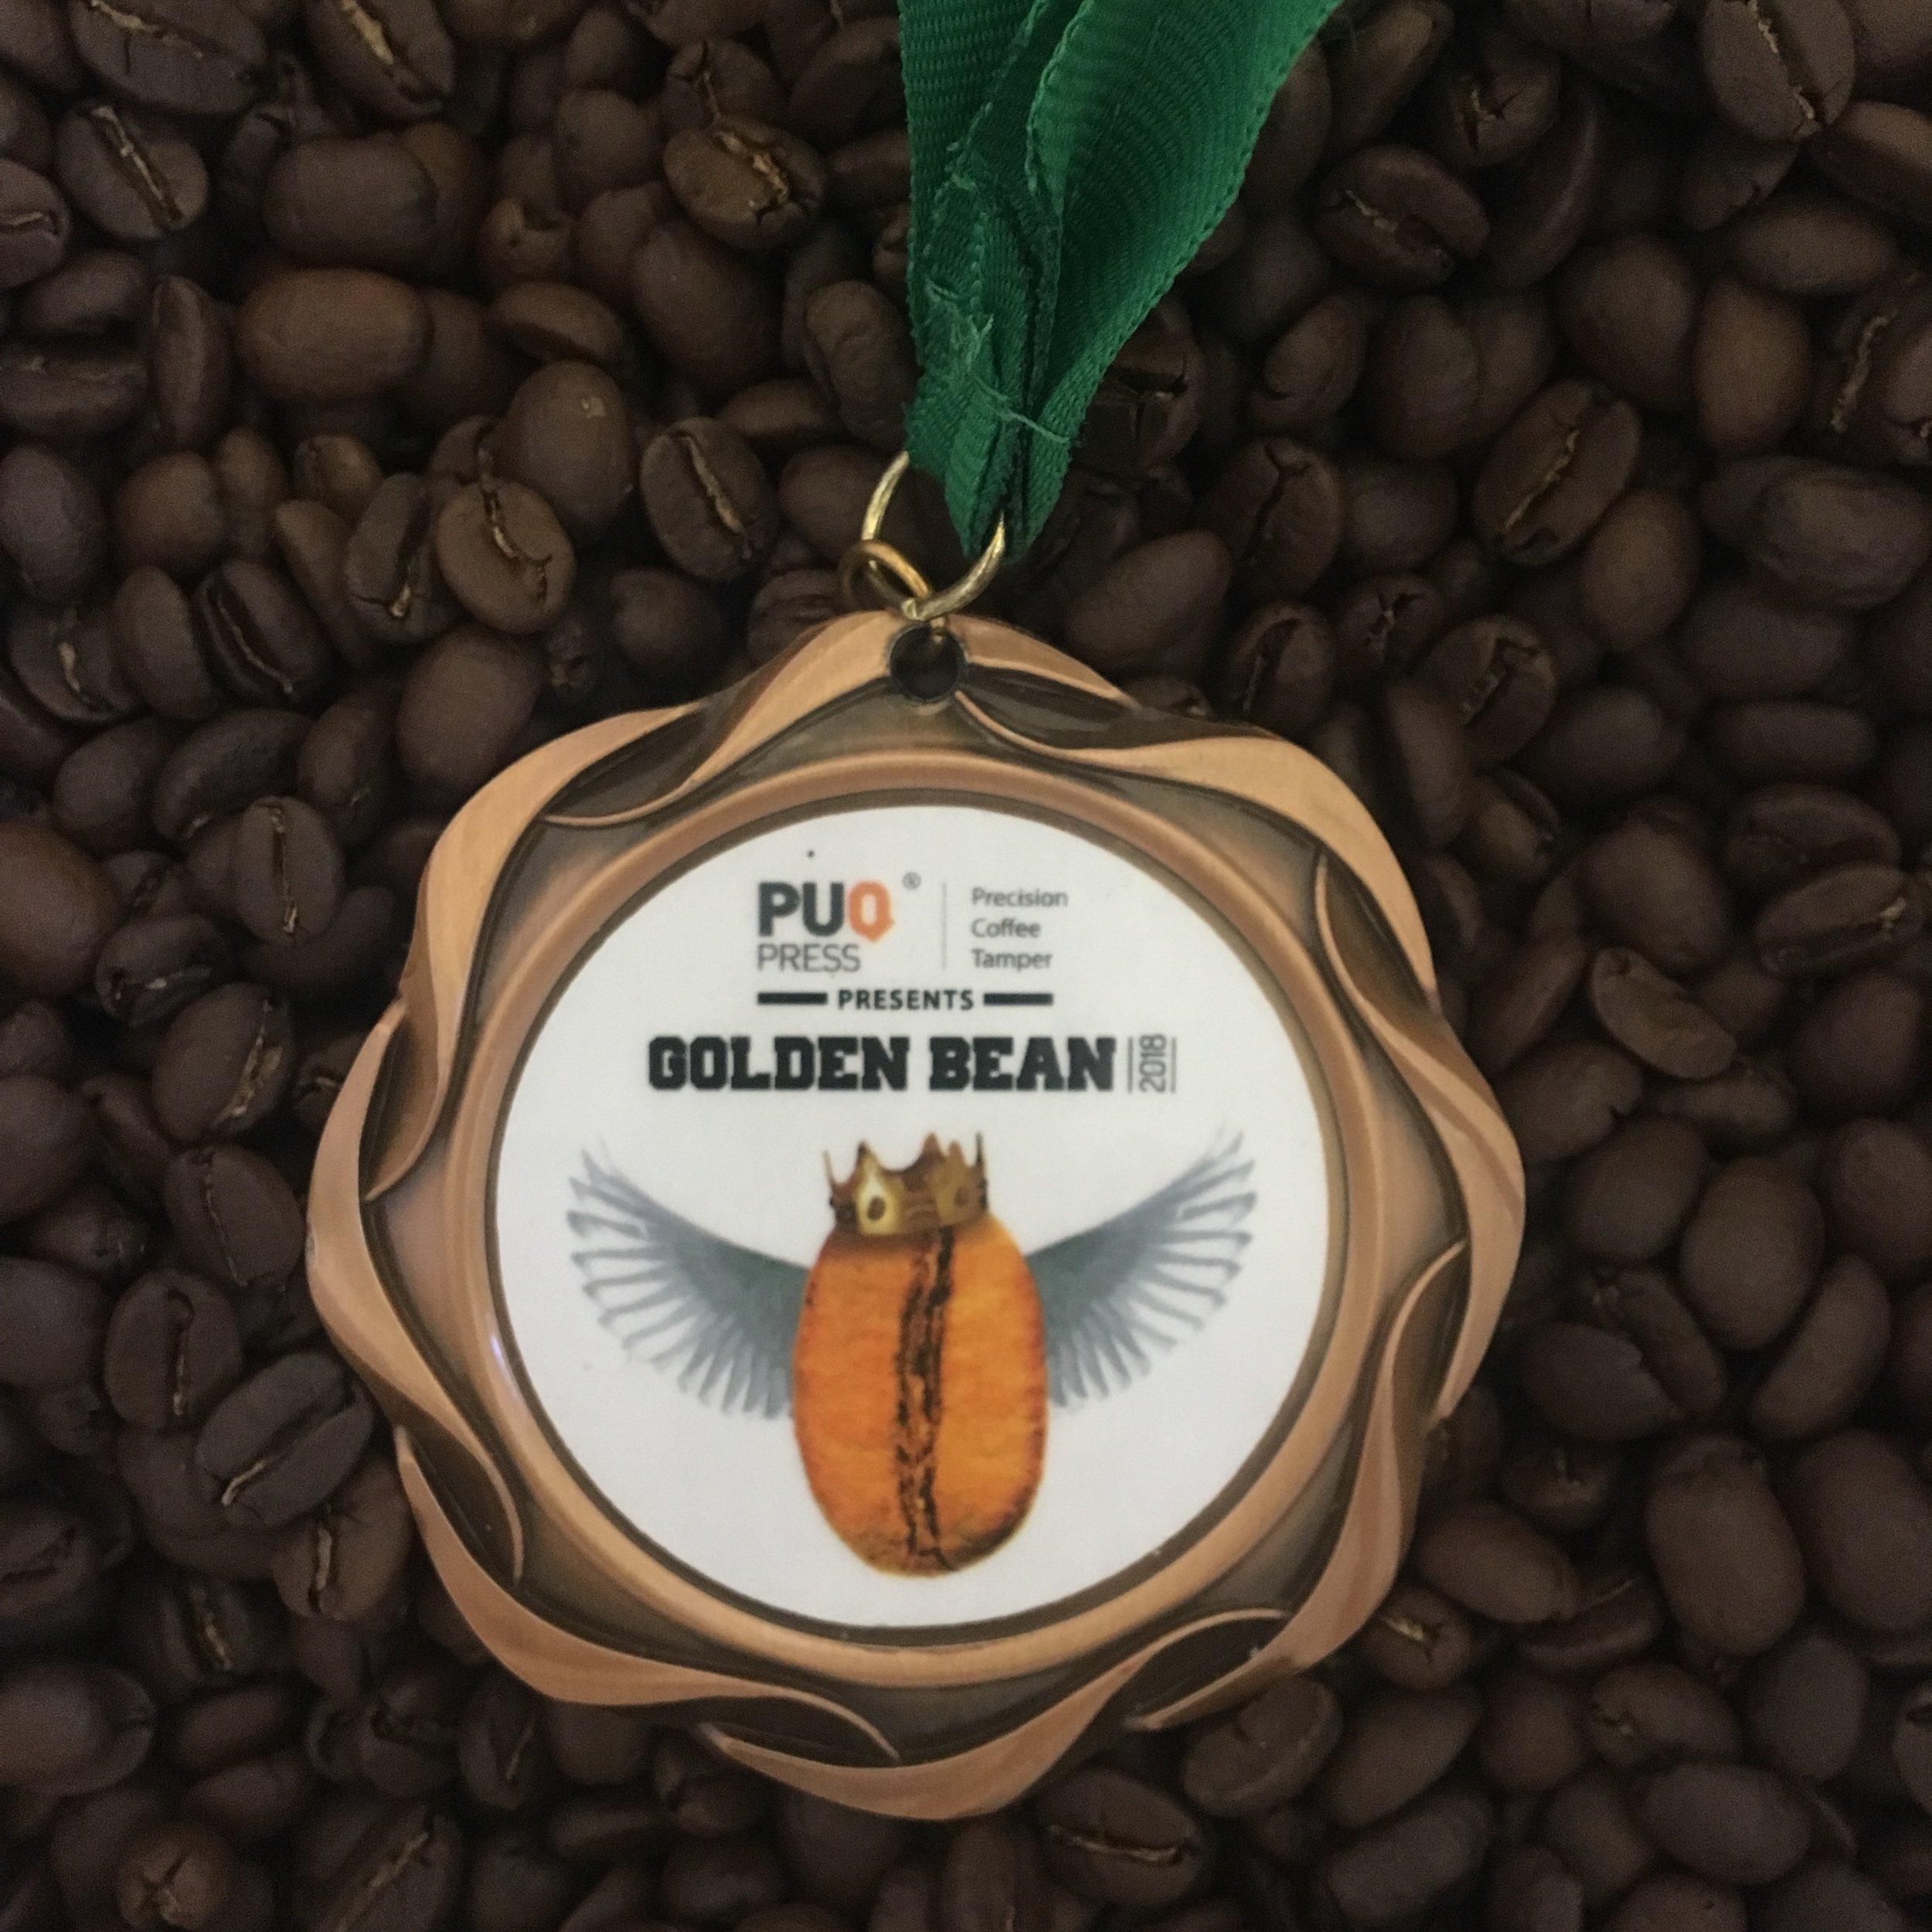 golden-bean-award-nicaragua